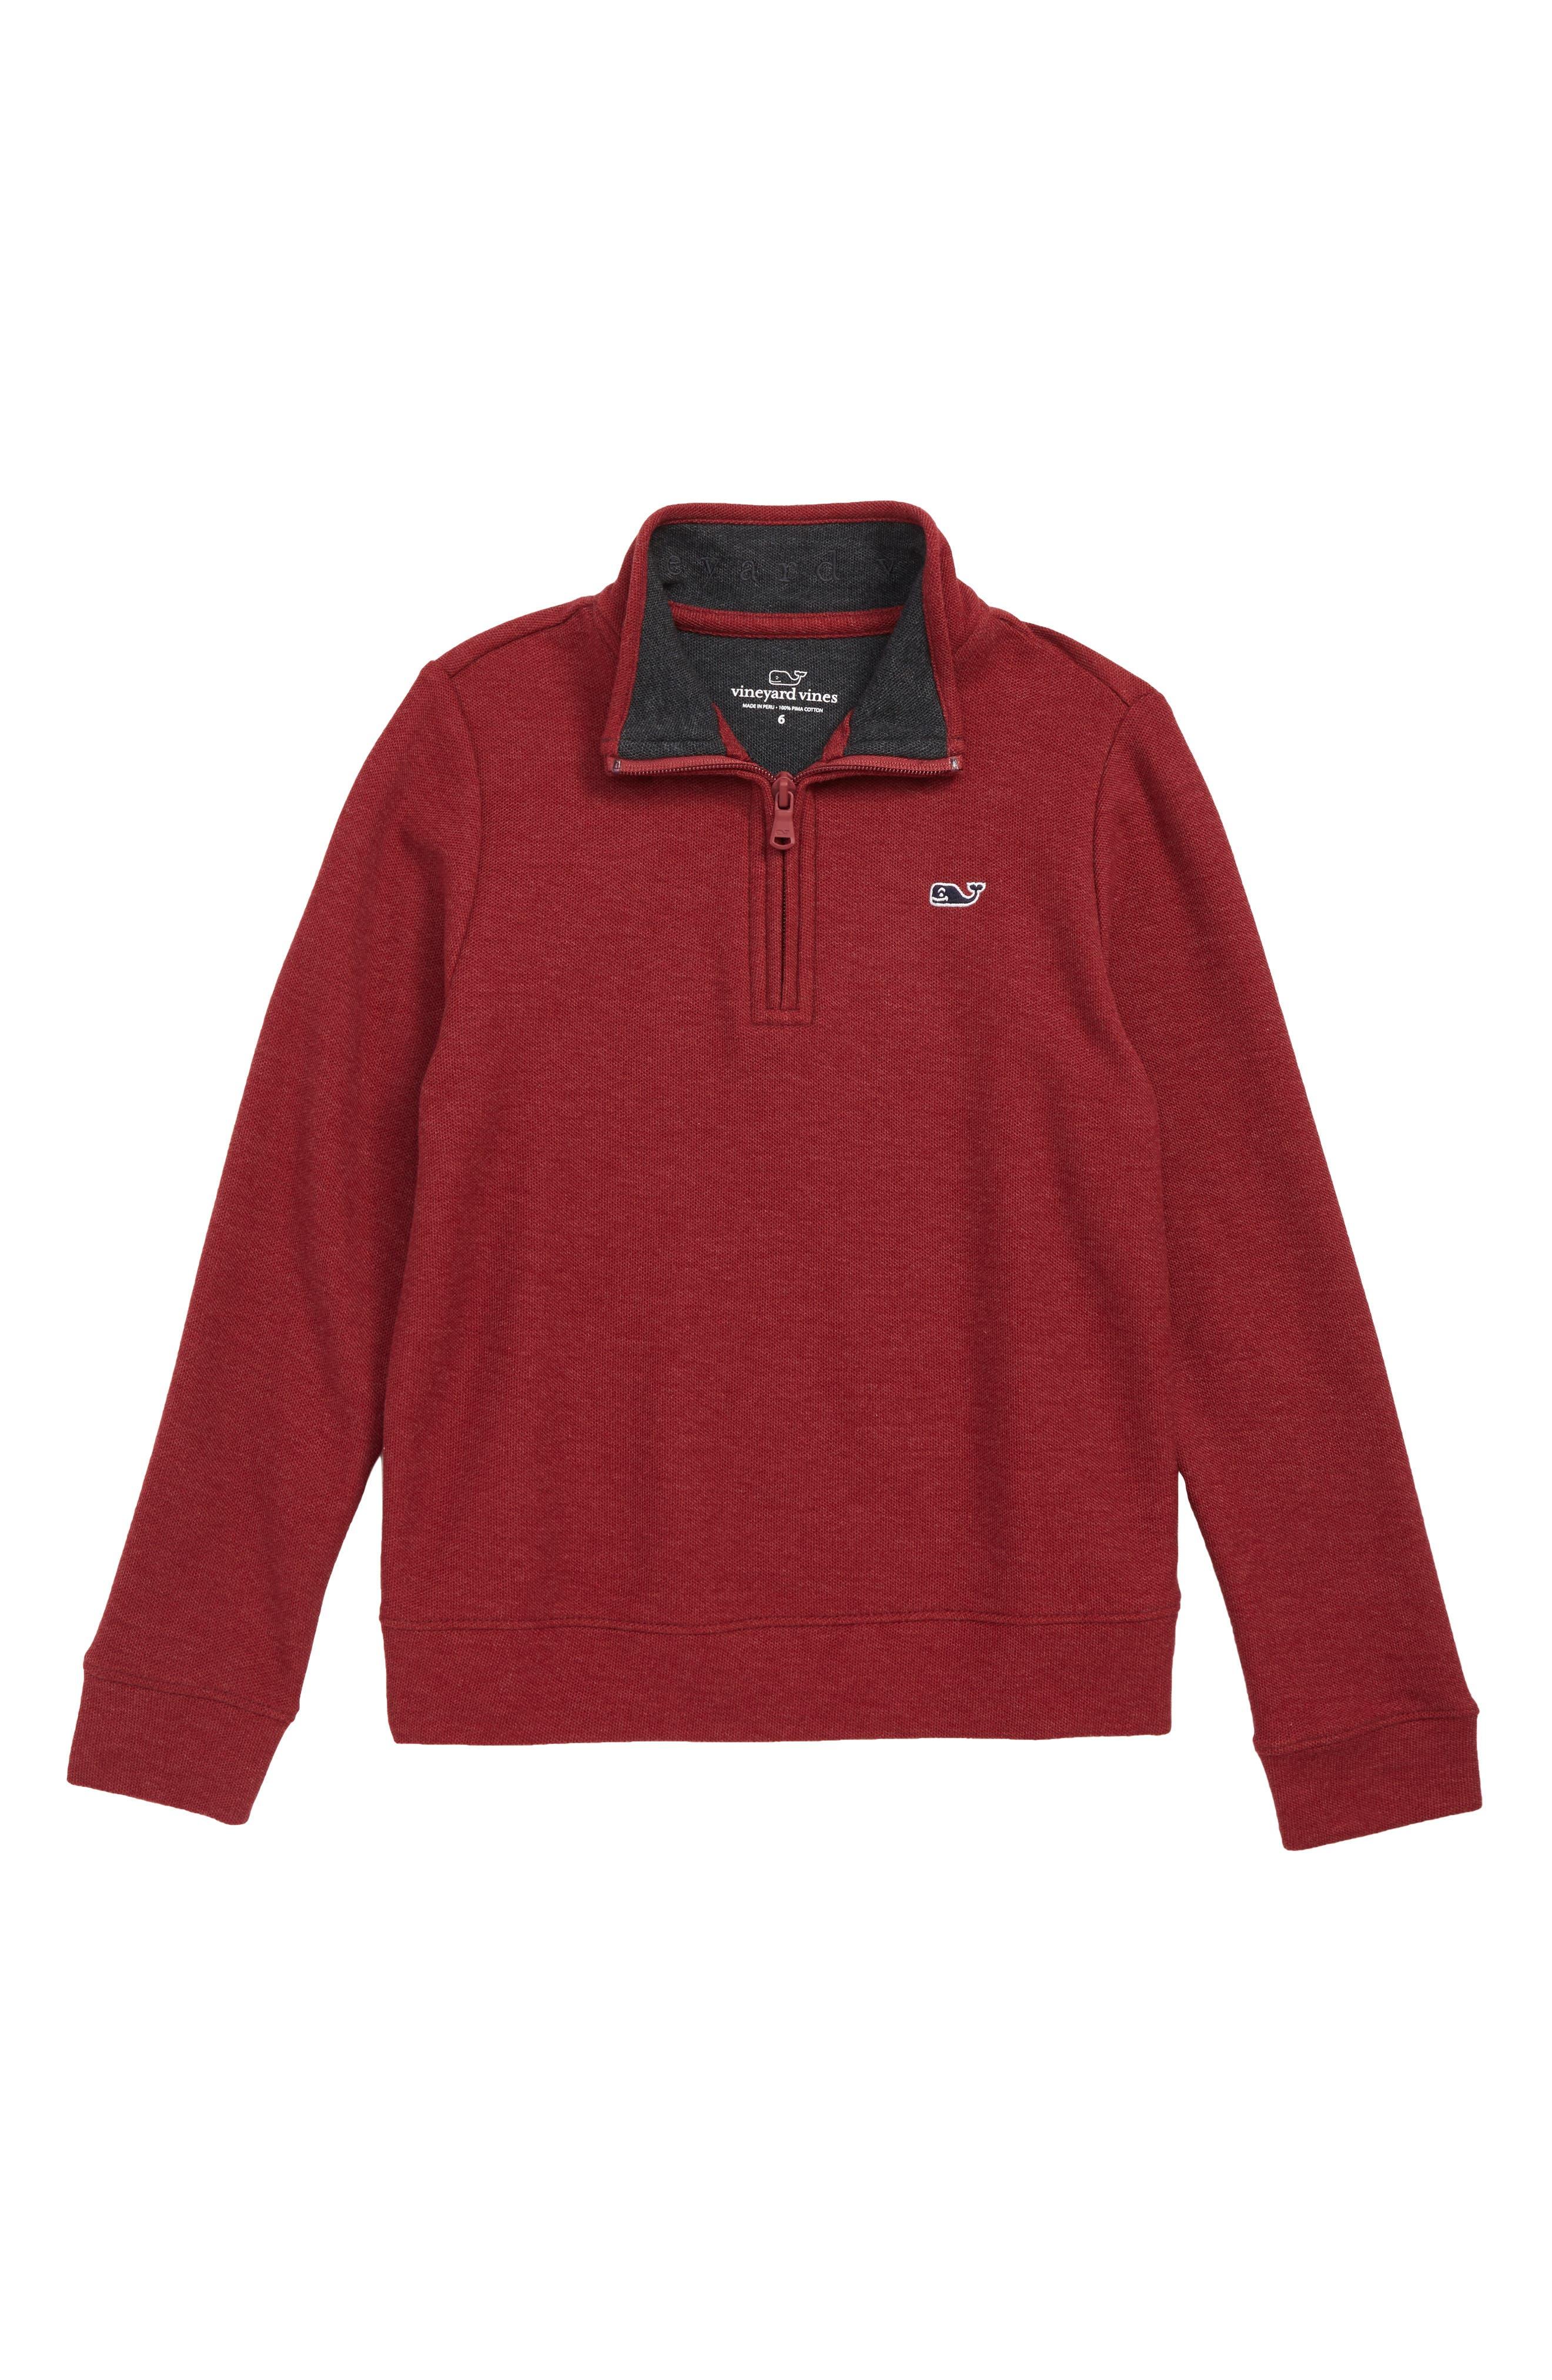 Toddler Boys Vineyard Vines Quarter Zip Sweater Size 4T  Red